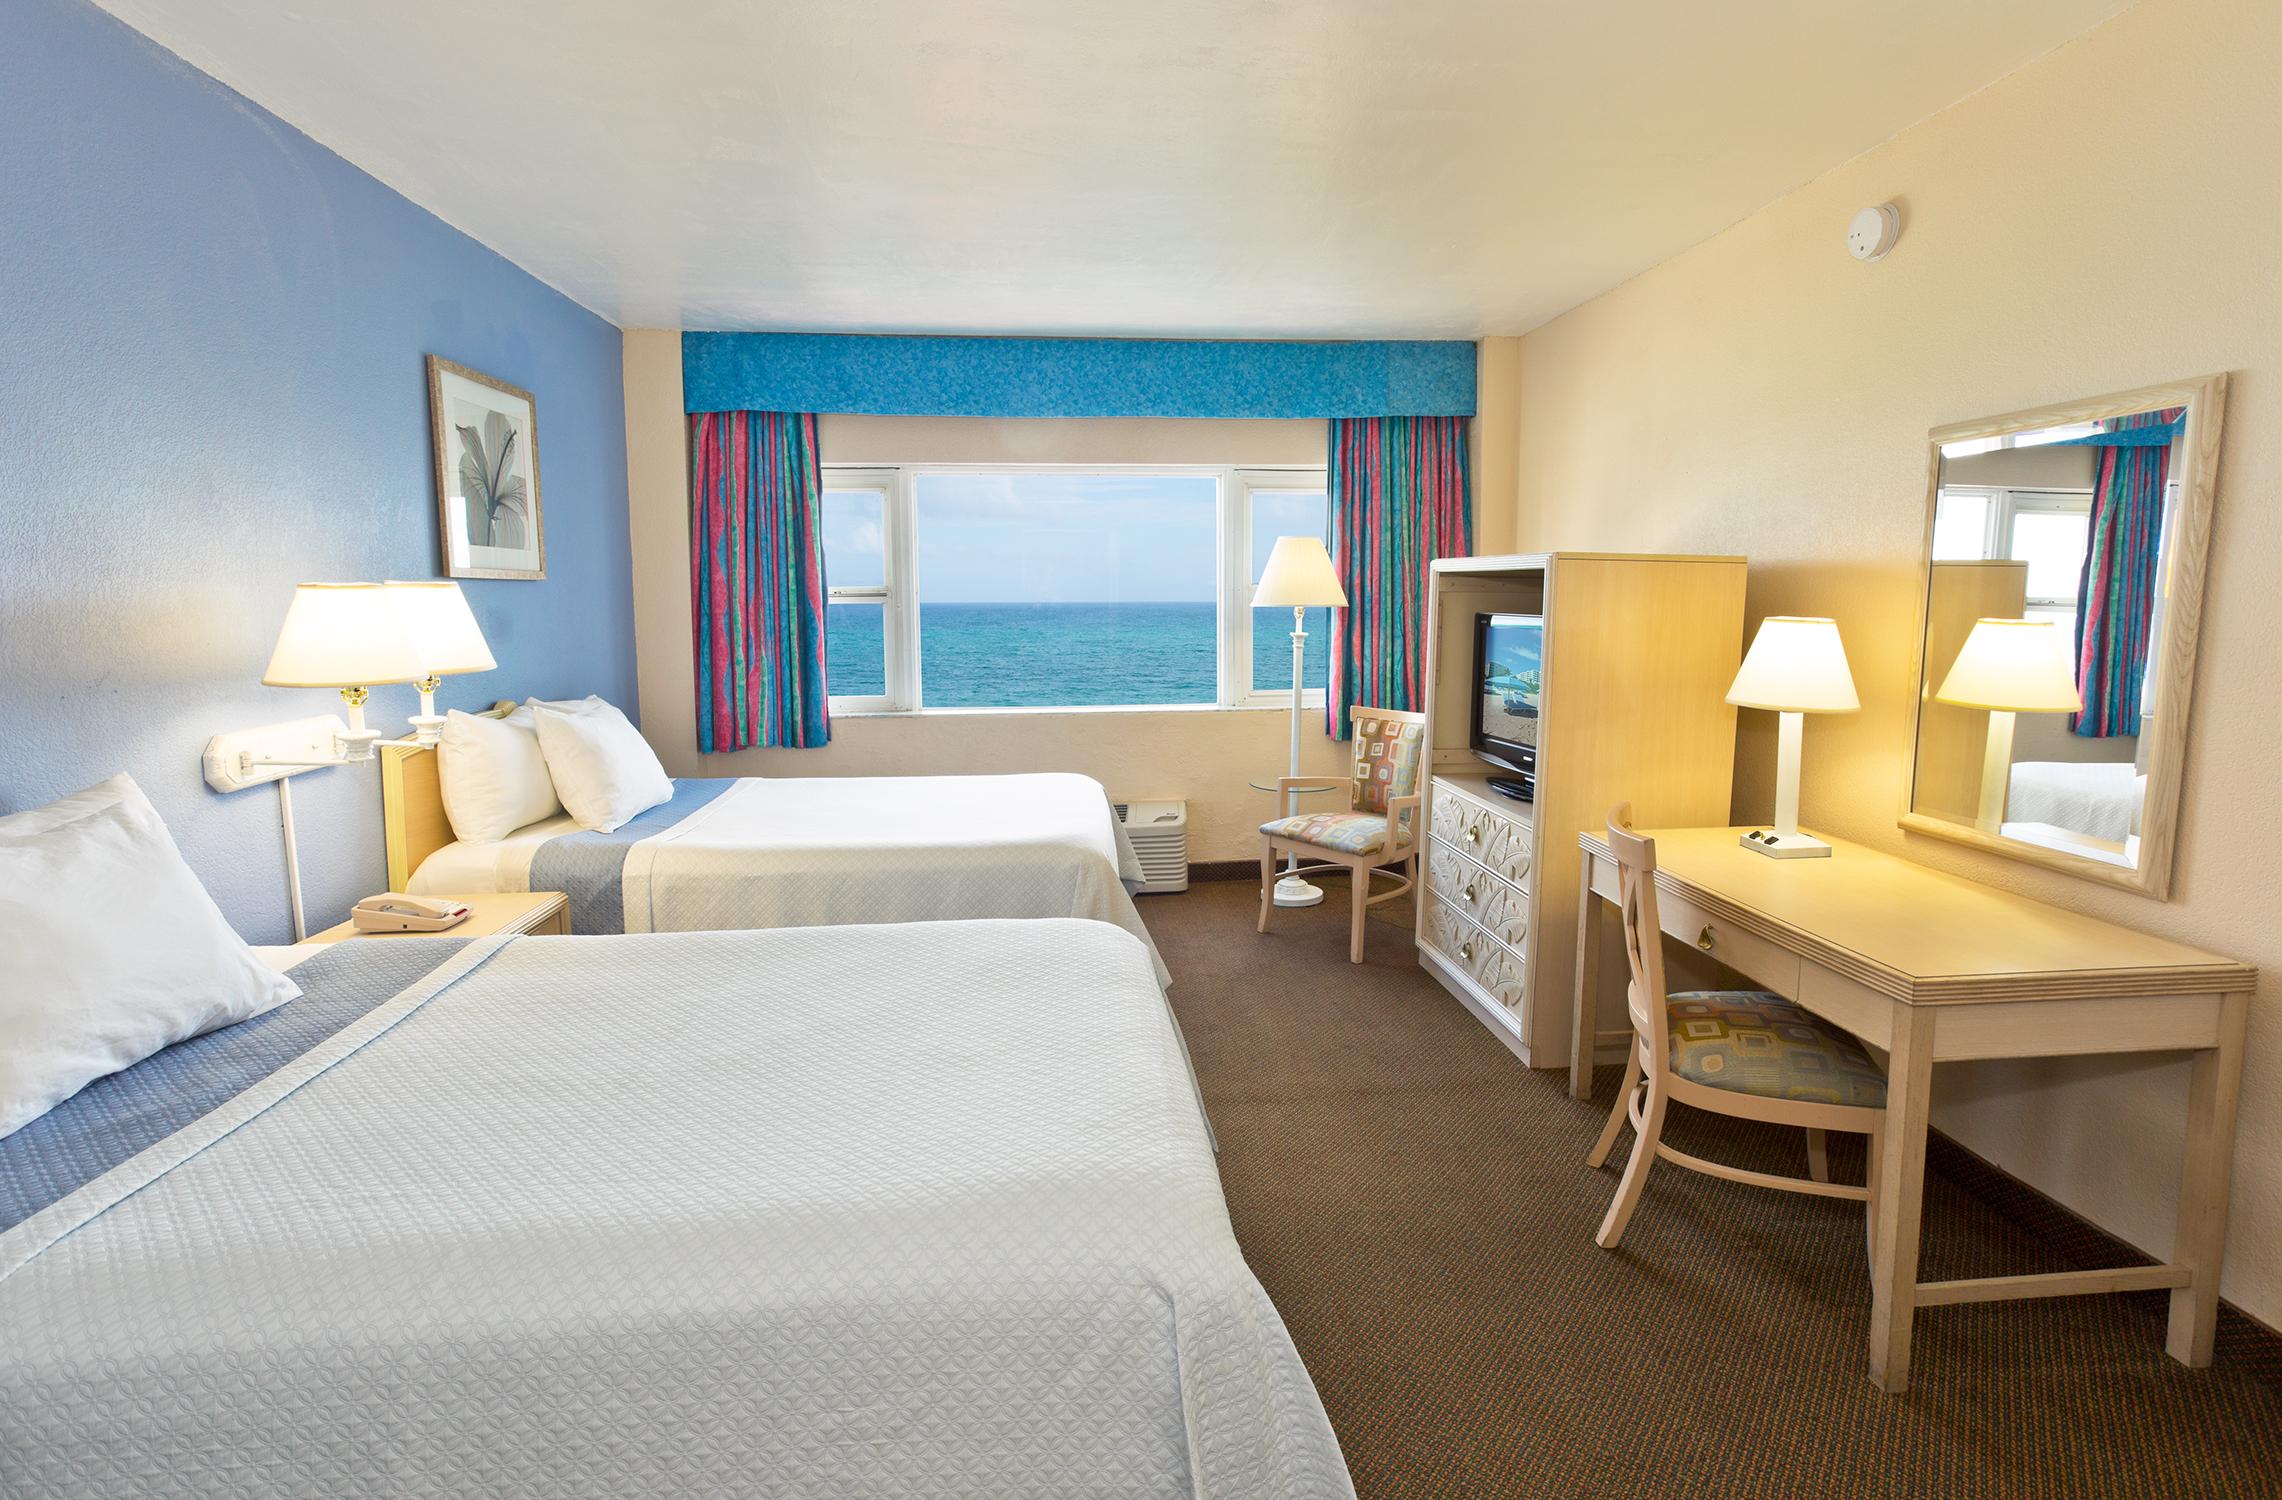 Vantage hotels adds 143 room lexington hotel miami beach